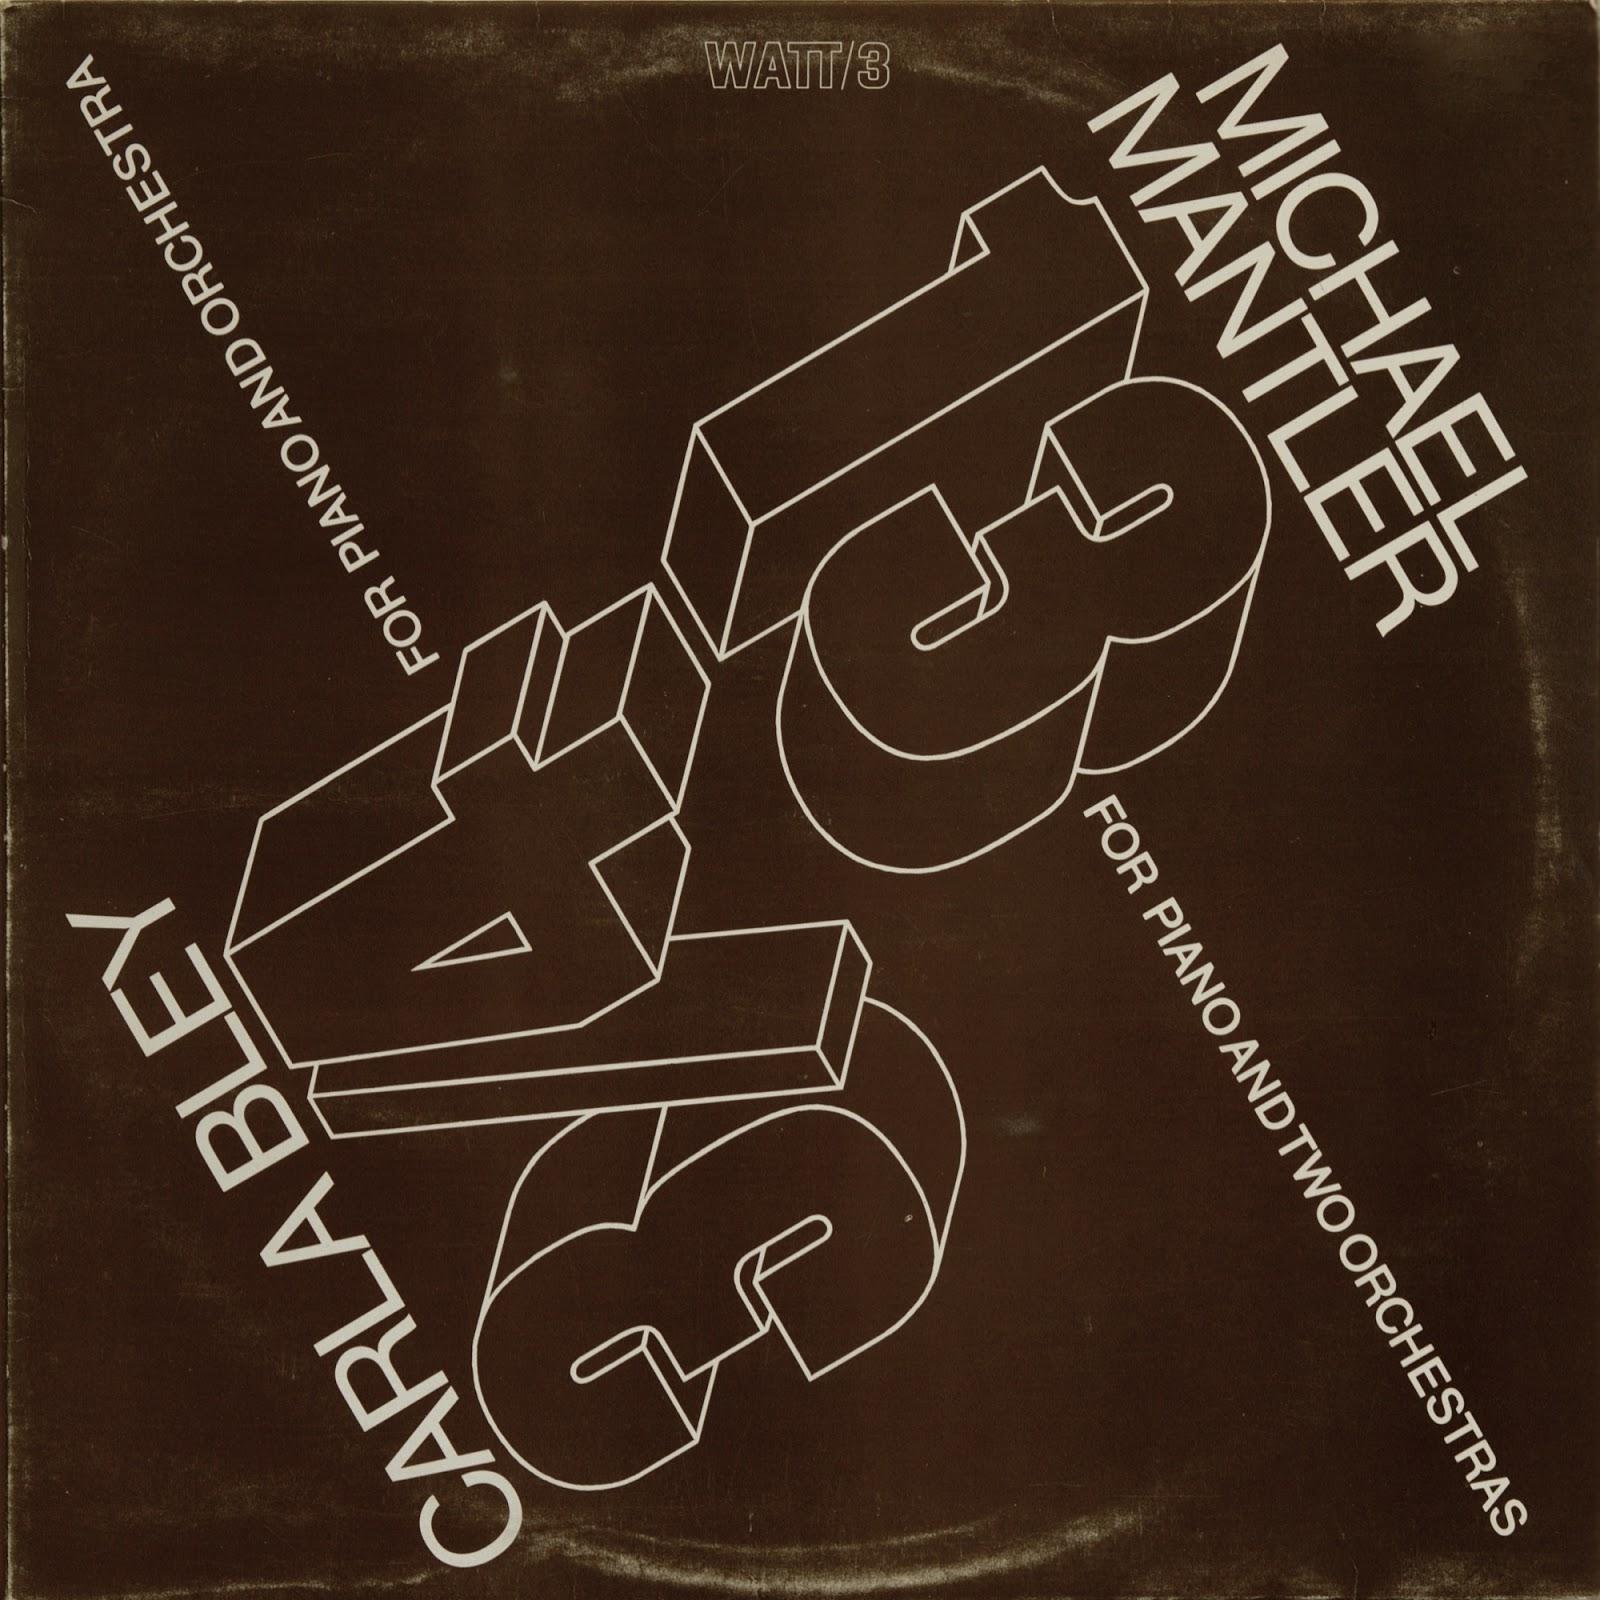 Carla Bley Mike Mantler Steve Lacy Jazz Realities